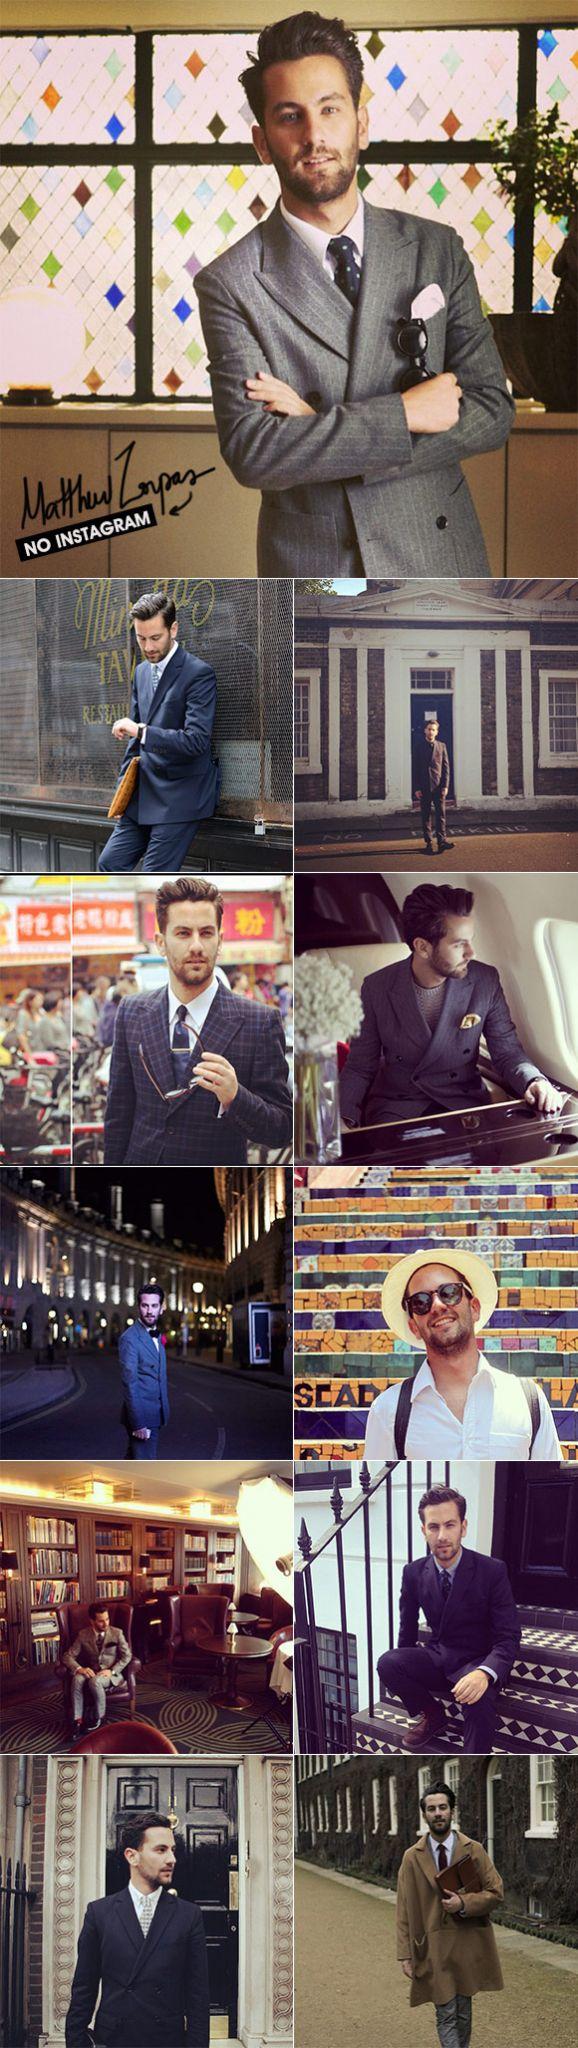 Achados da Bia | Moda Masculina | Eduardo Lautert | Quem seguir no instagram | Matthew Zorpas